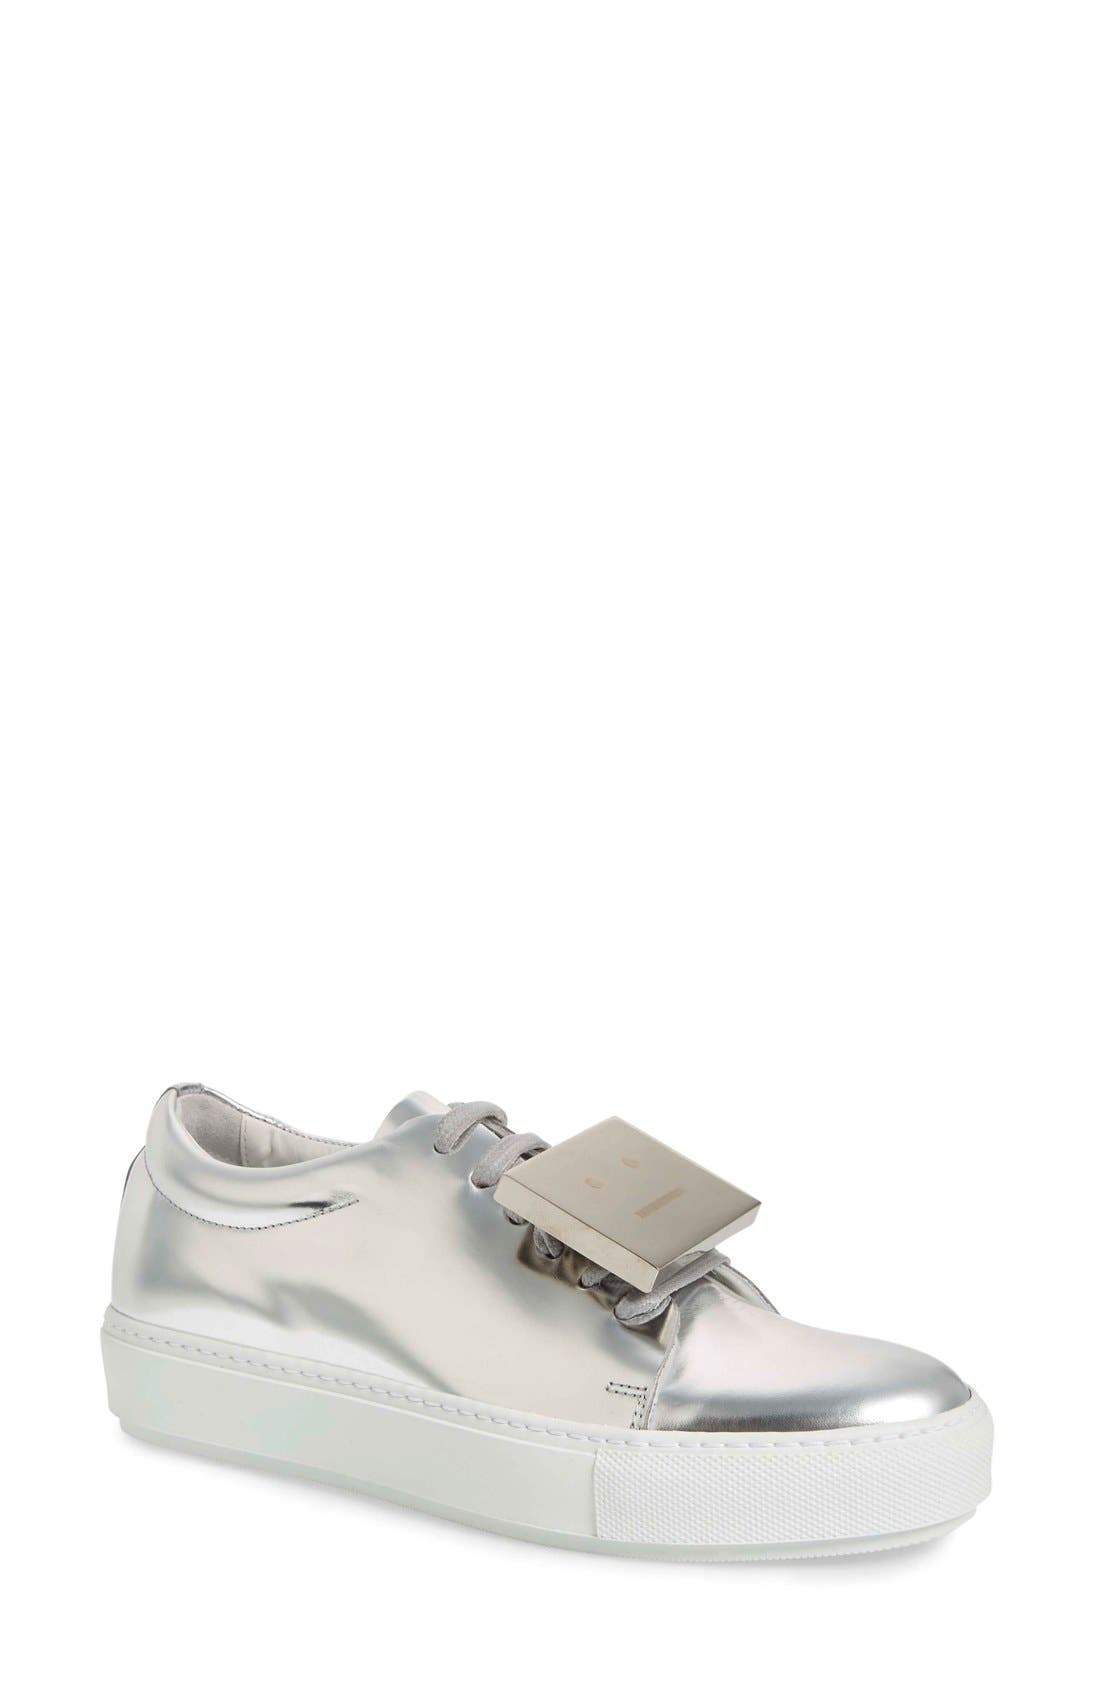 Adriana Silver Metallic Sneaker,                         Main,                         color, 044